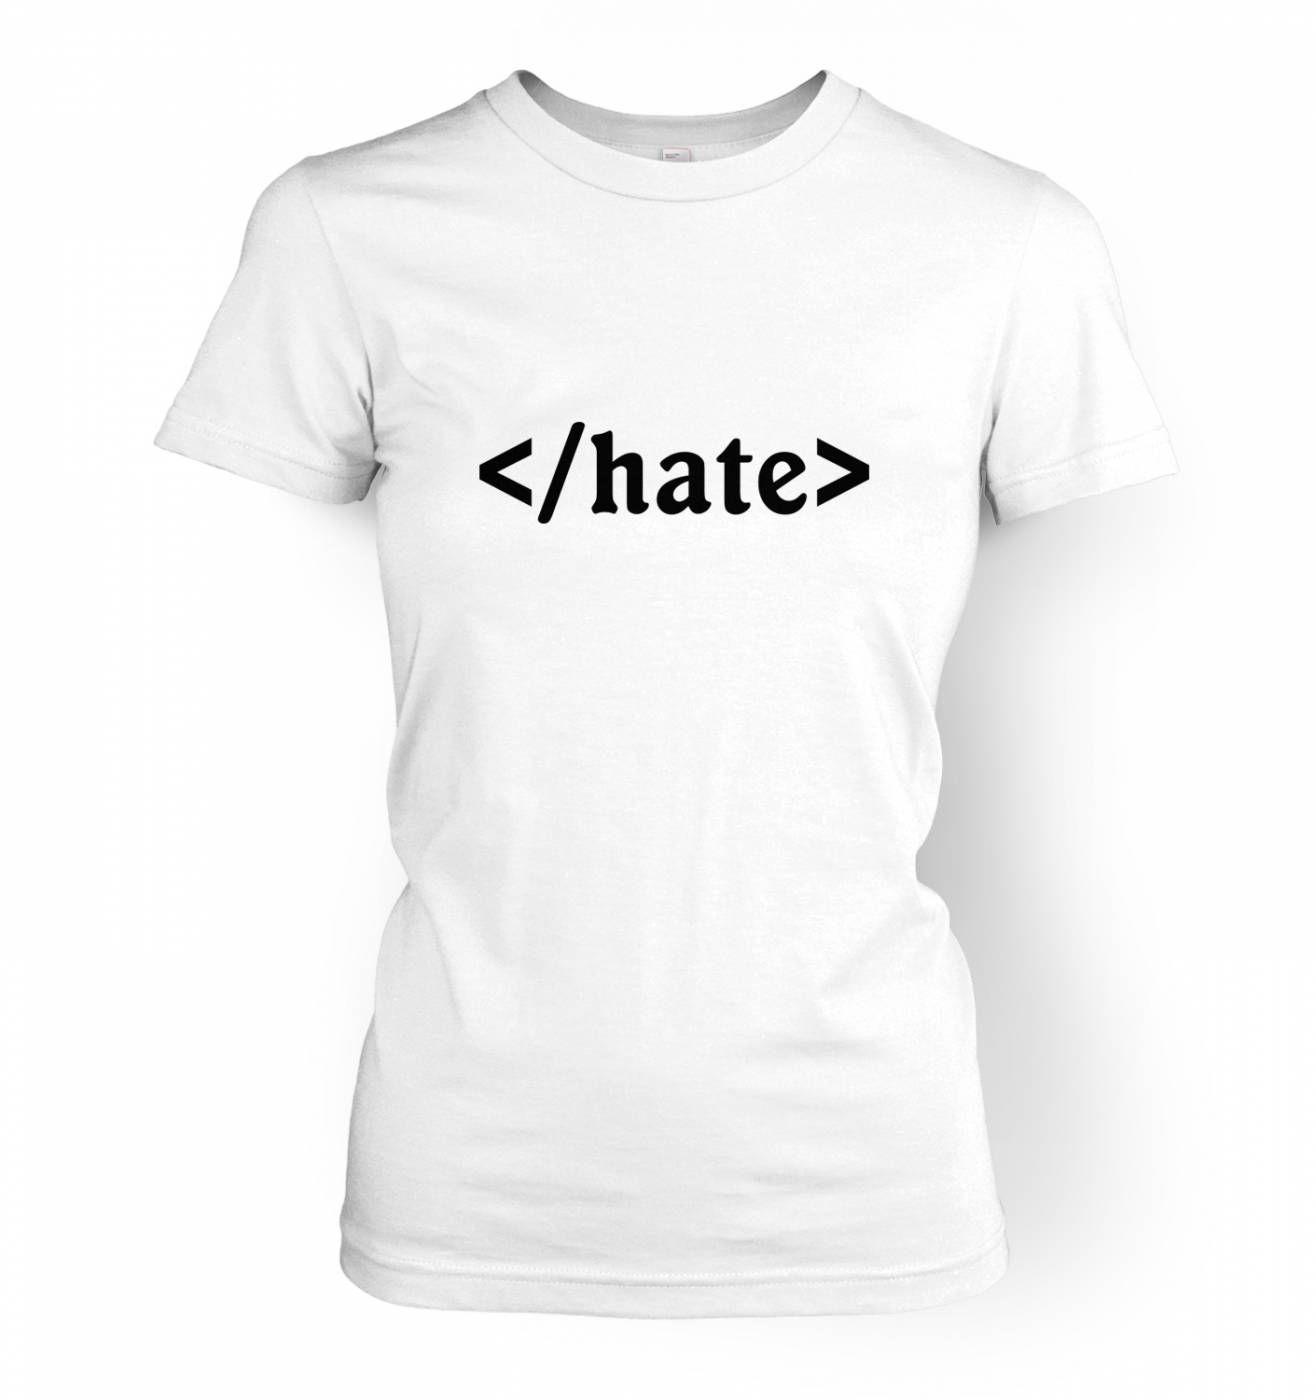 End Hate women's t-shirt